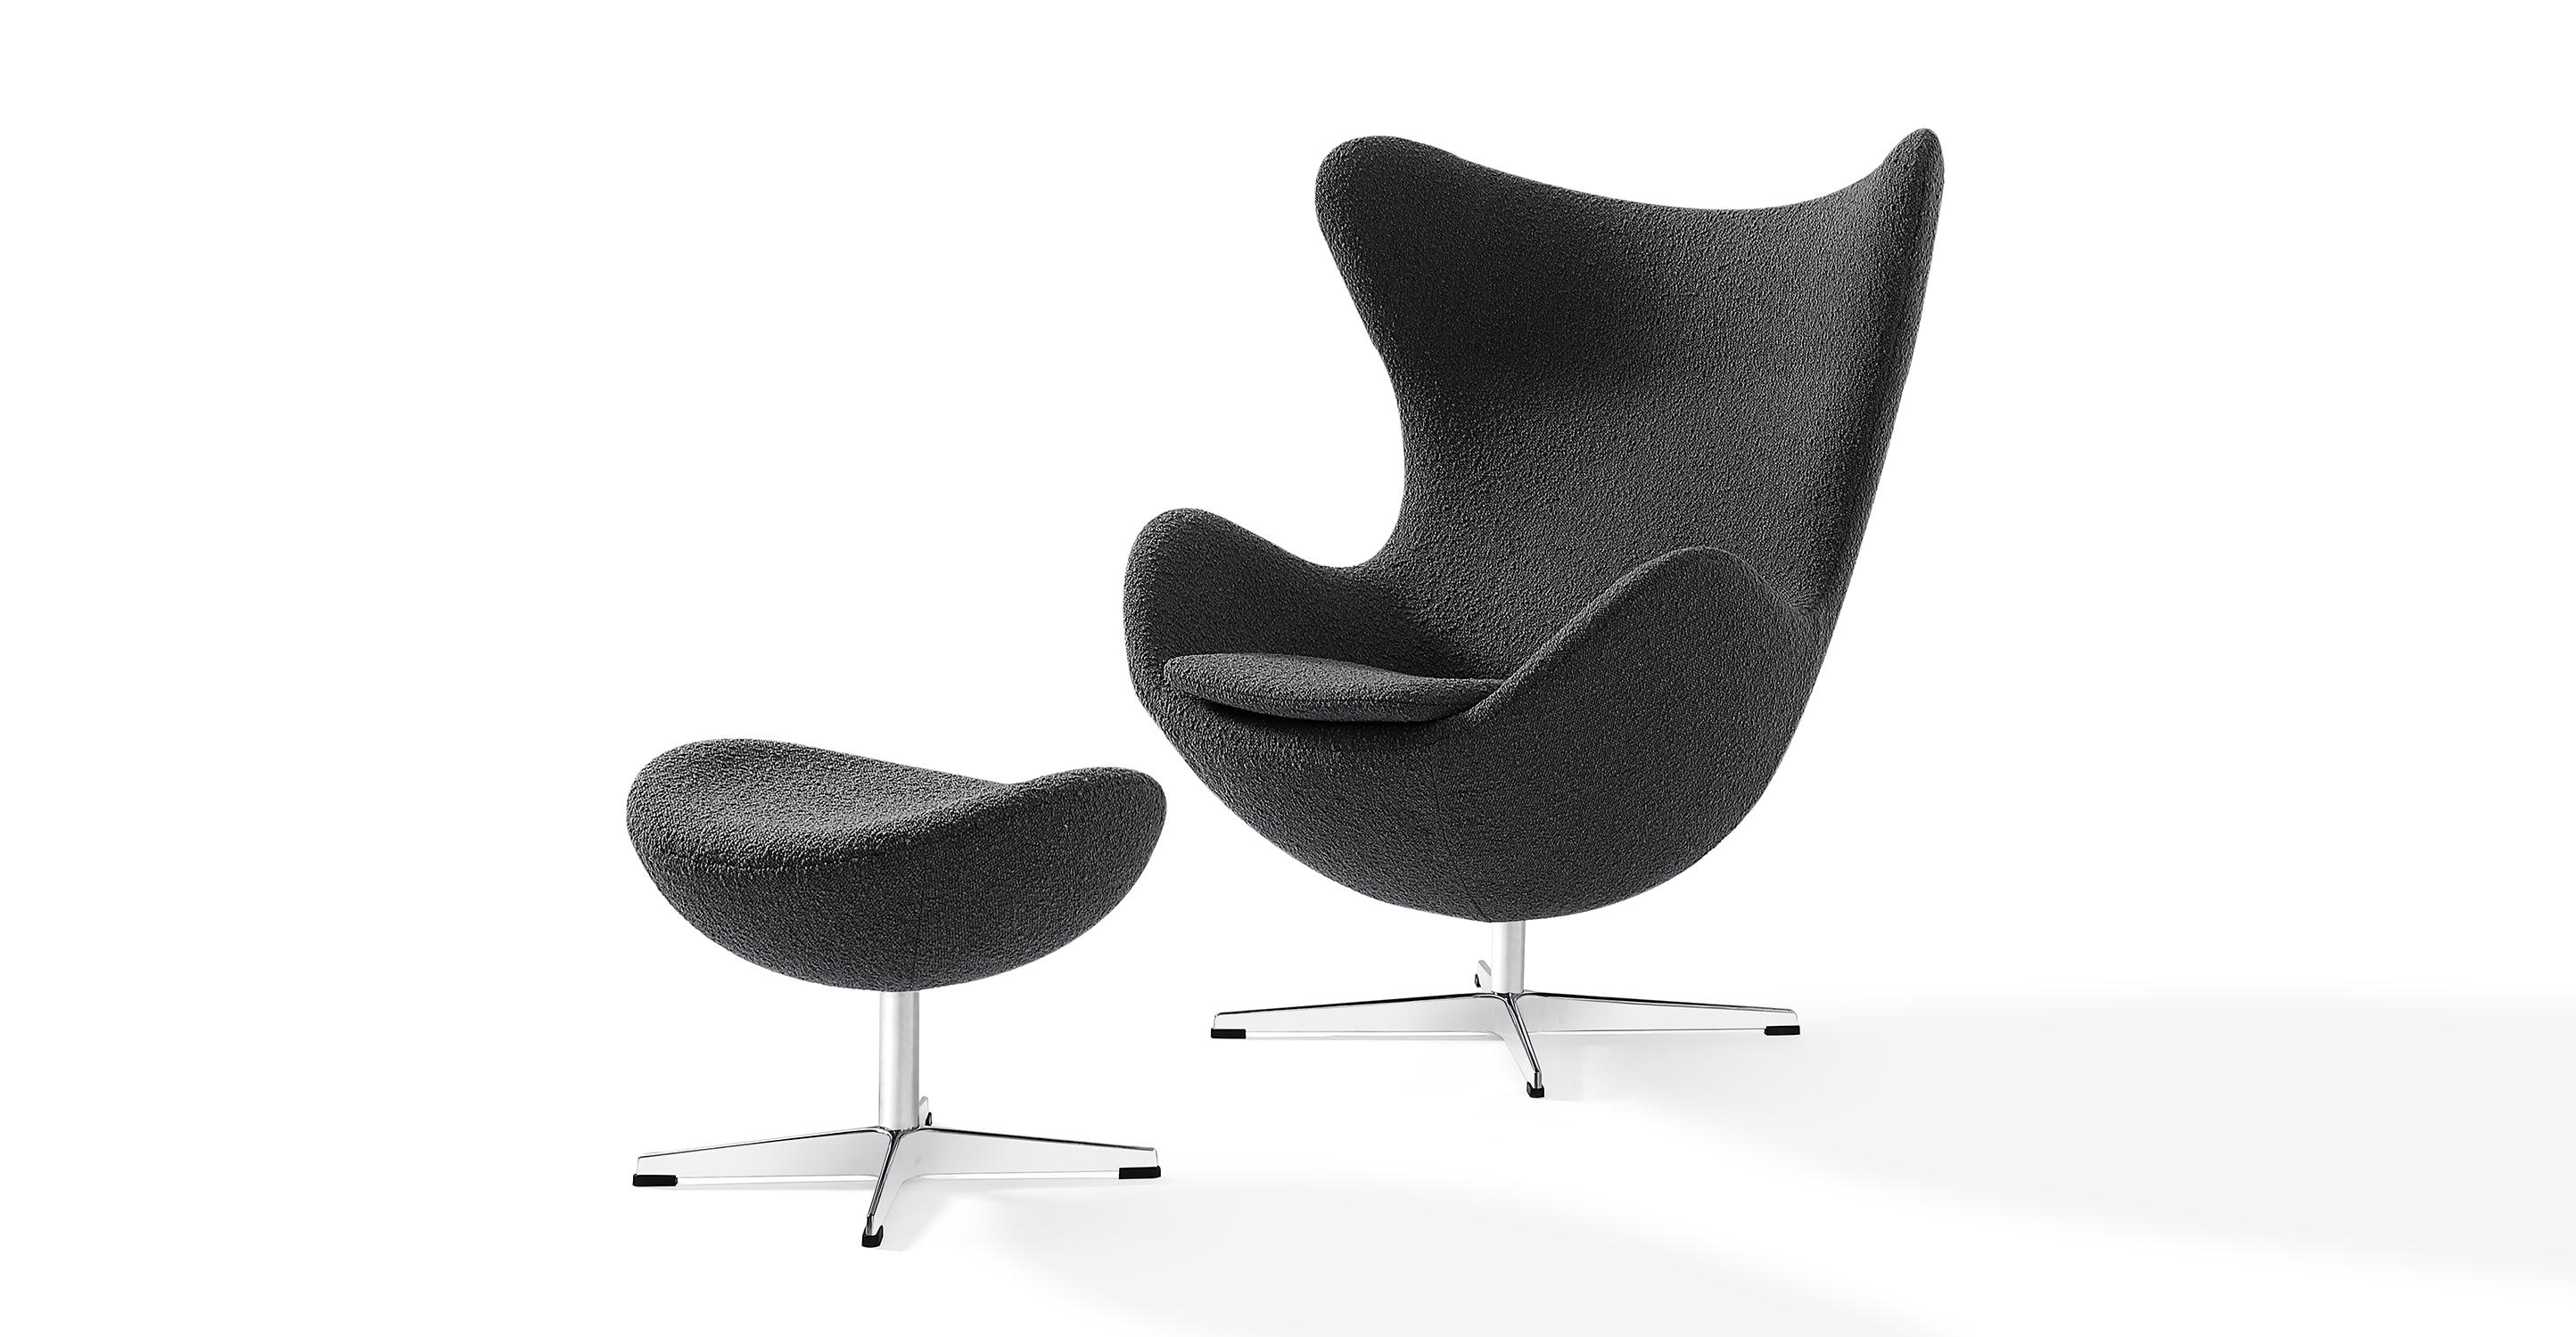 Amoeba Swivel Fabric Chair & Ottoman, Gris Boucle